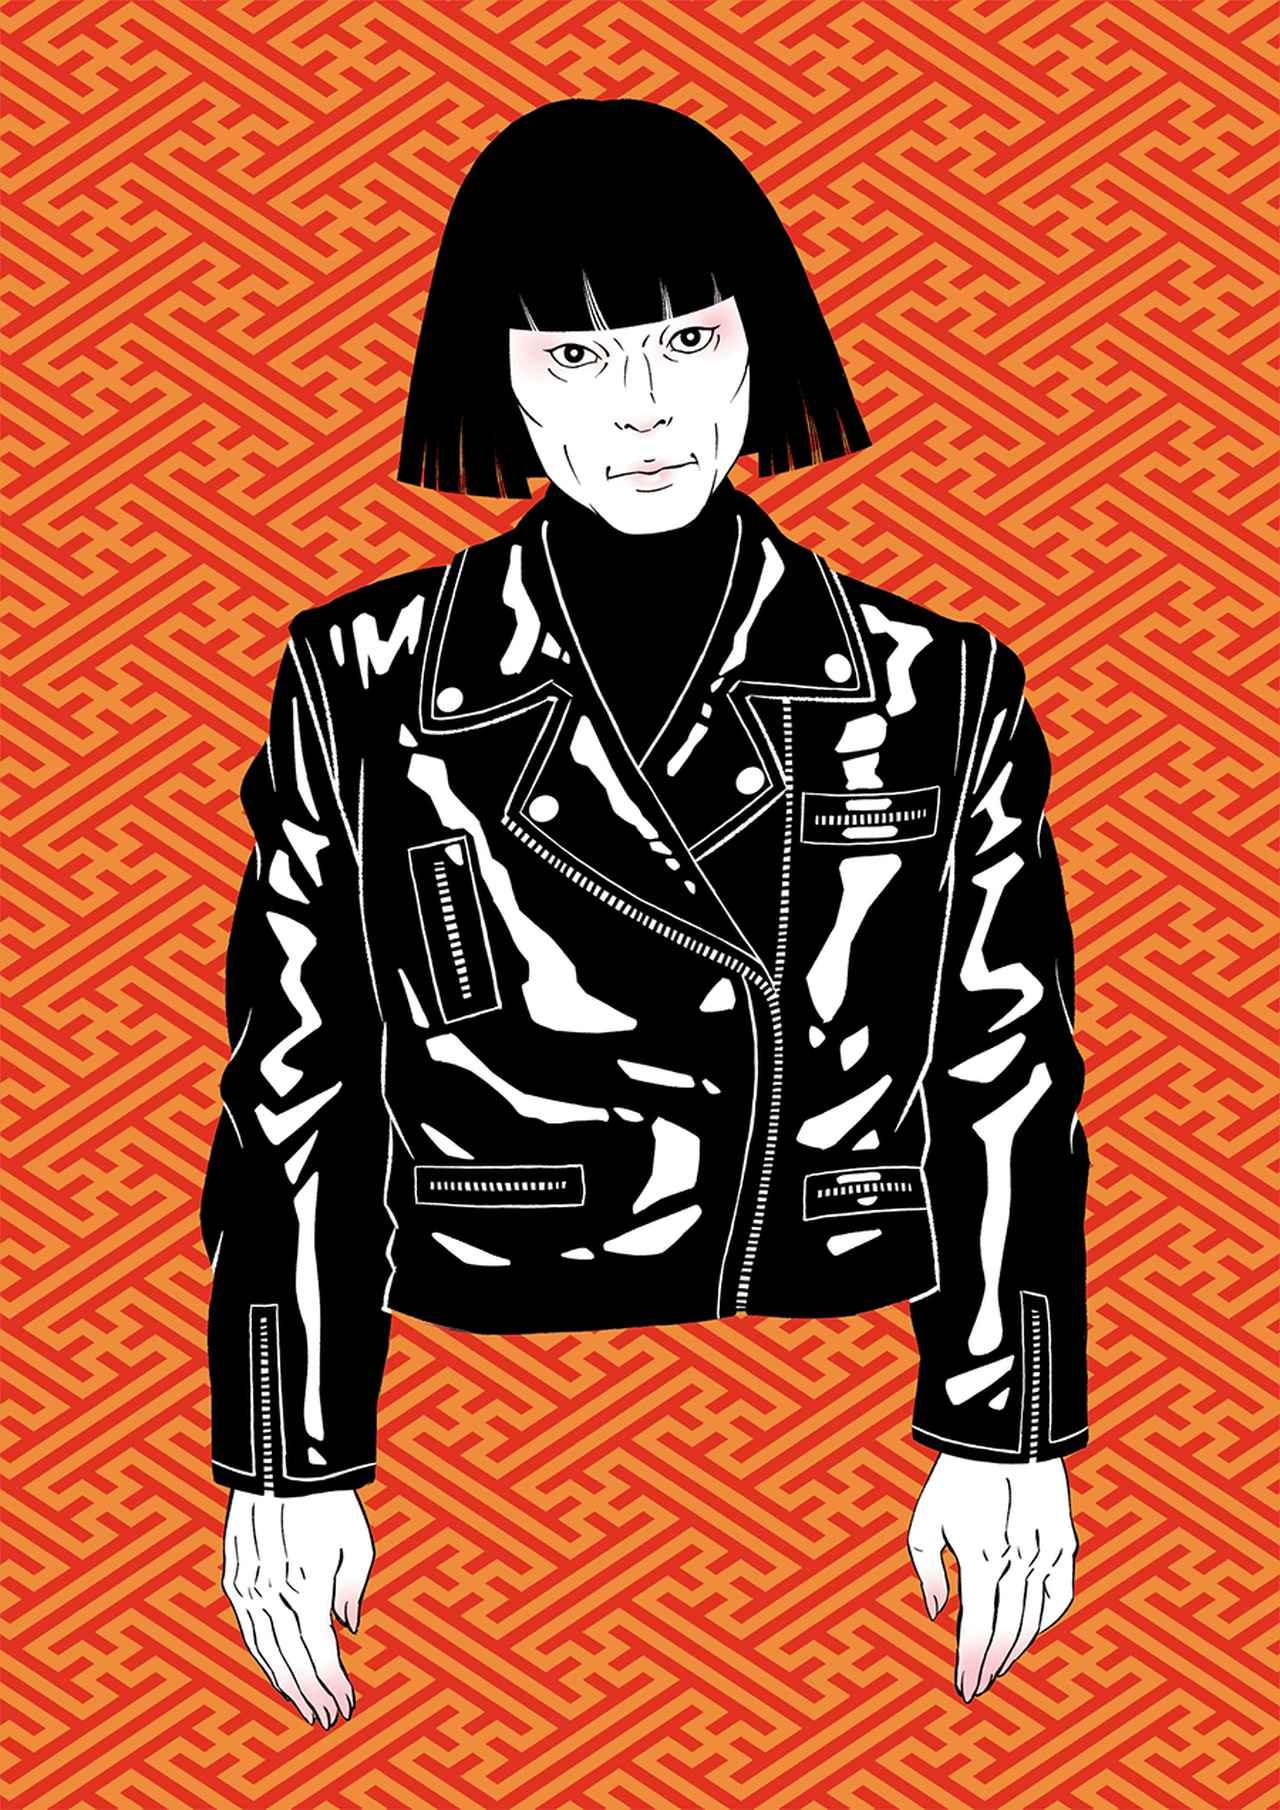 Images : 1番目の画像 - 「川久保 玲ーー ファッションの偉大なる解放者」のアルバム - T JAPAN:The New York Times Style Magazine 公式サイト